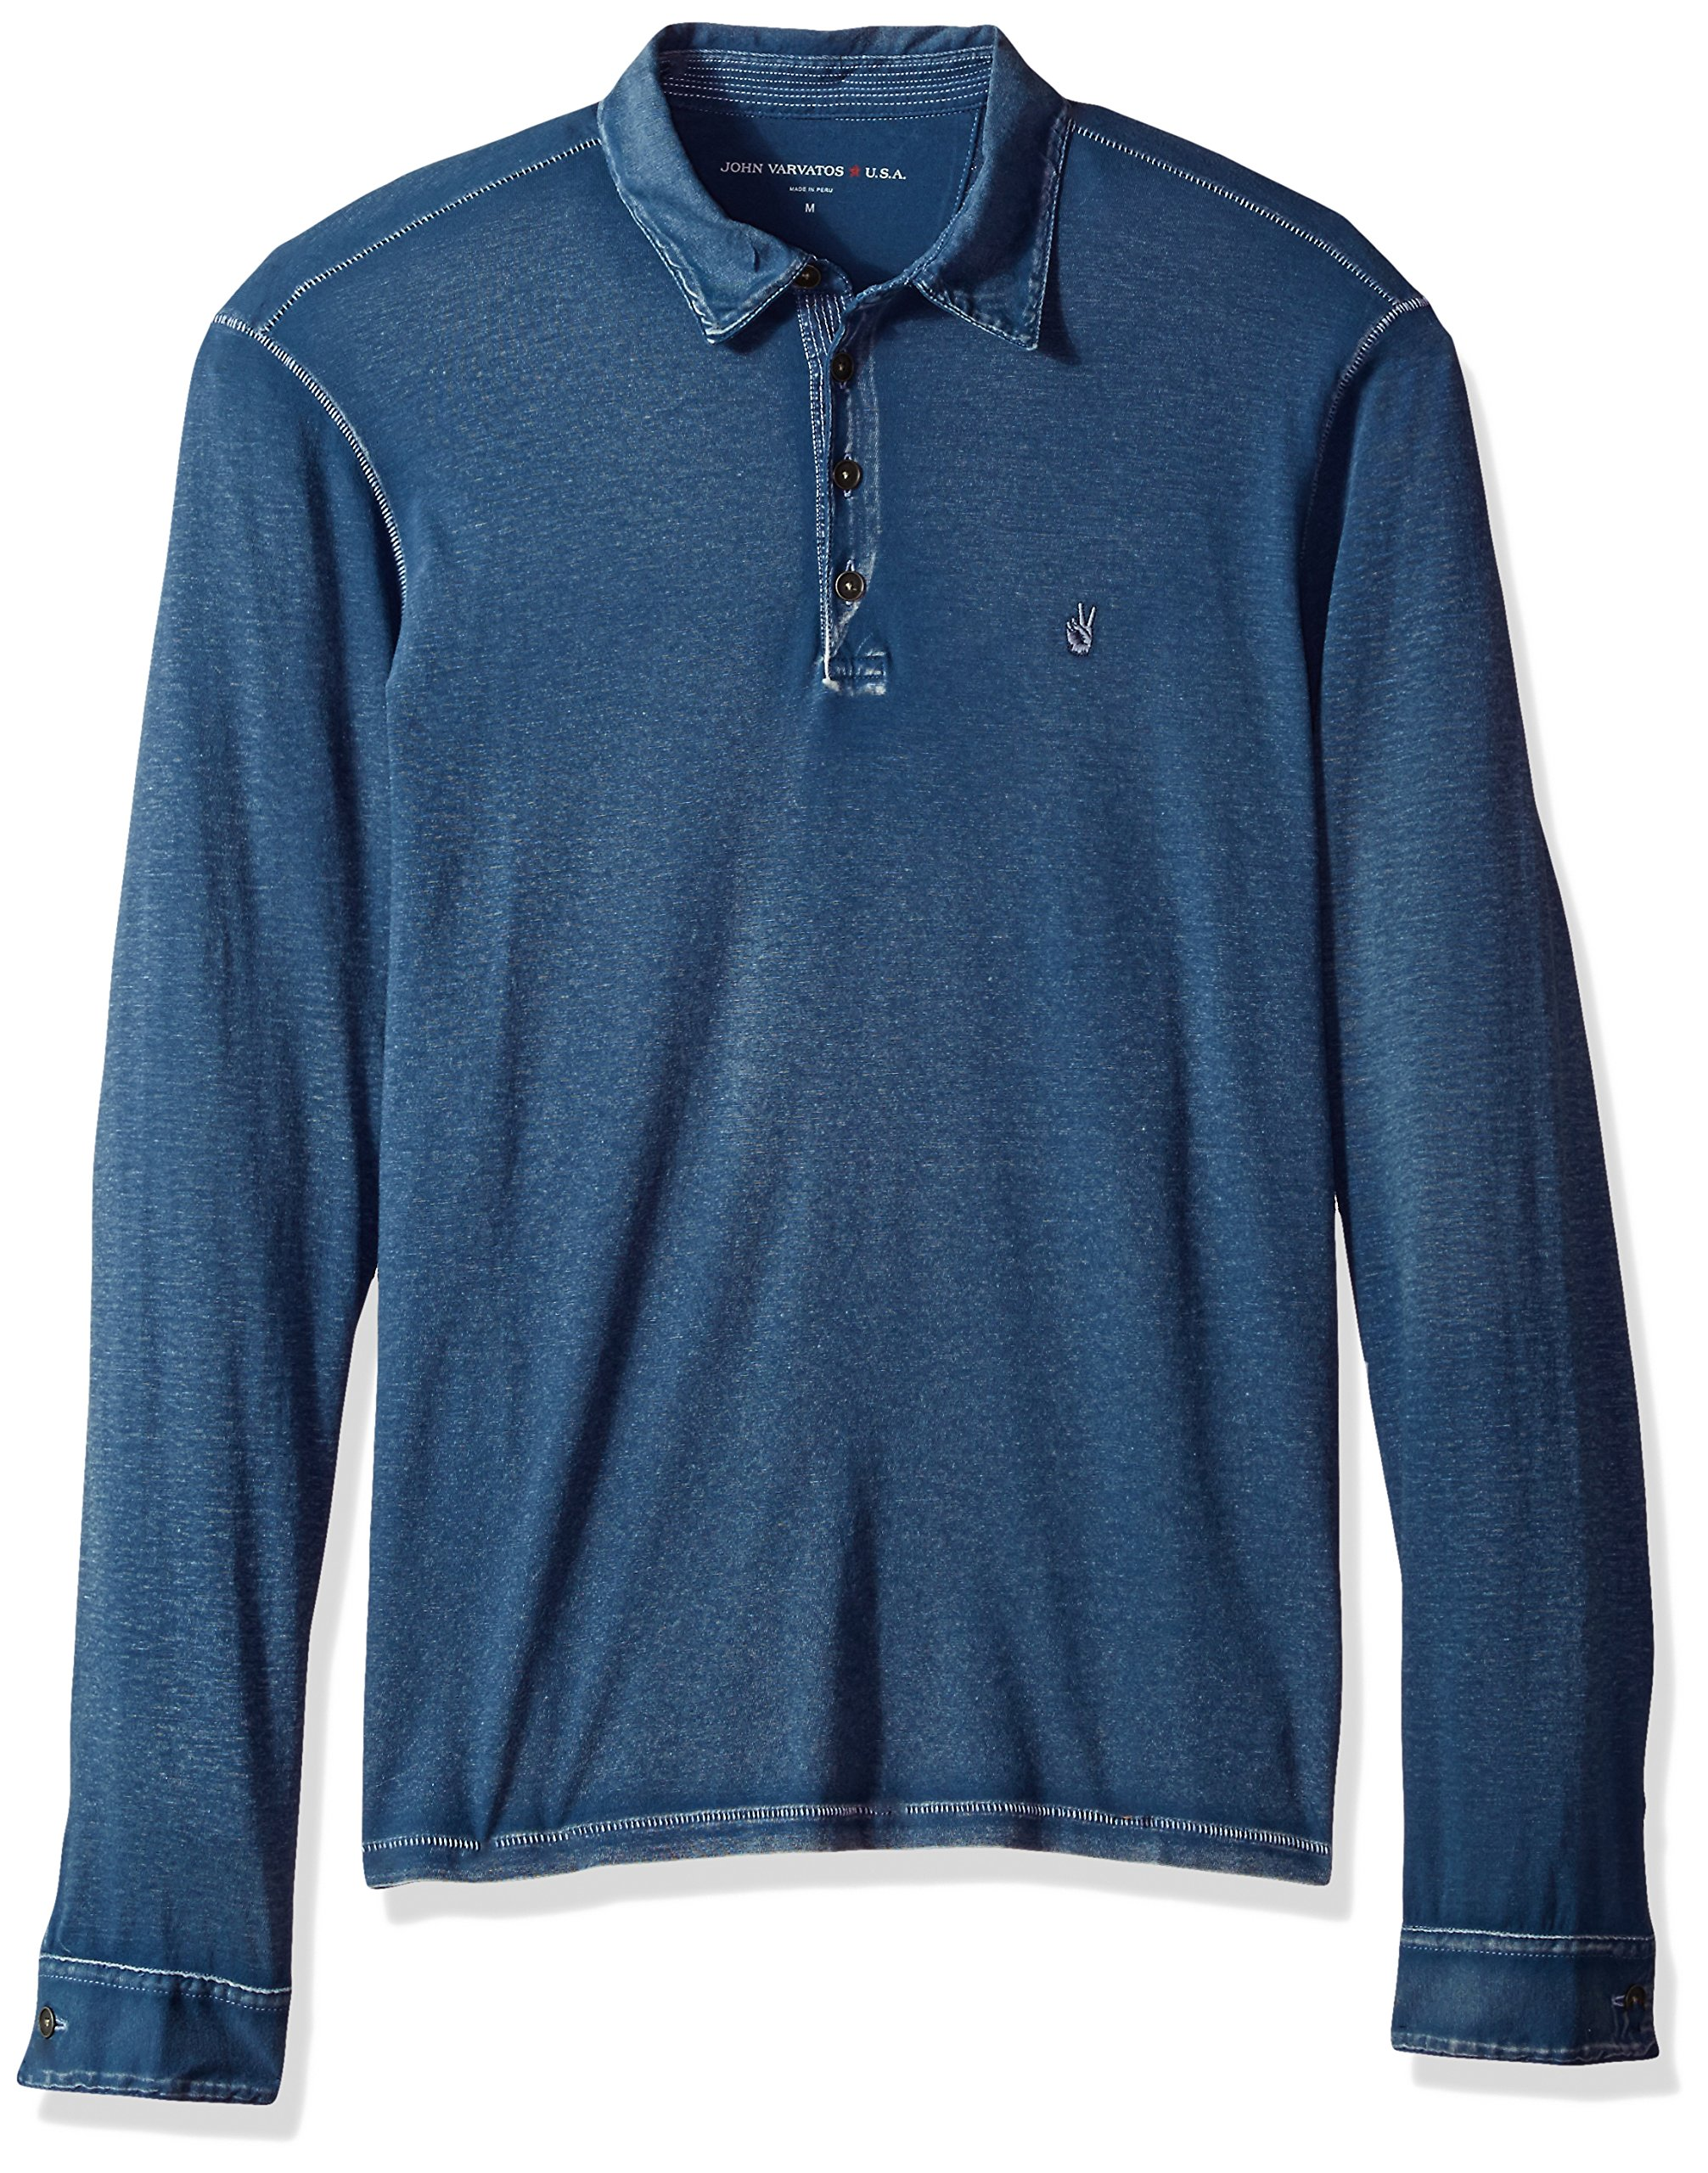 John Varvatos Men's Long Sleeved Polo AQP4B 409, Storm Blue, Large